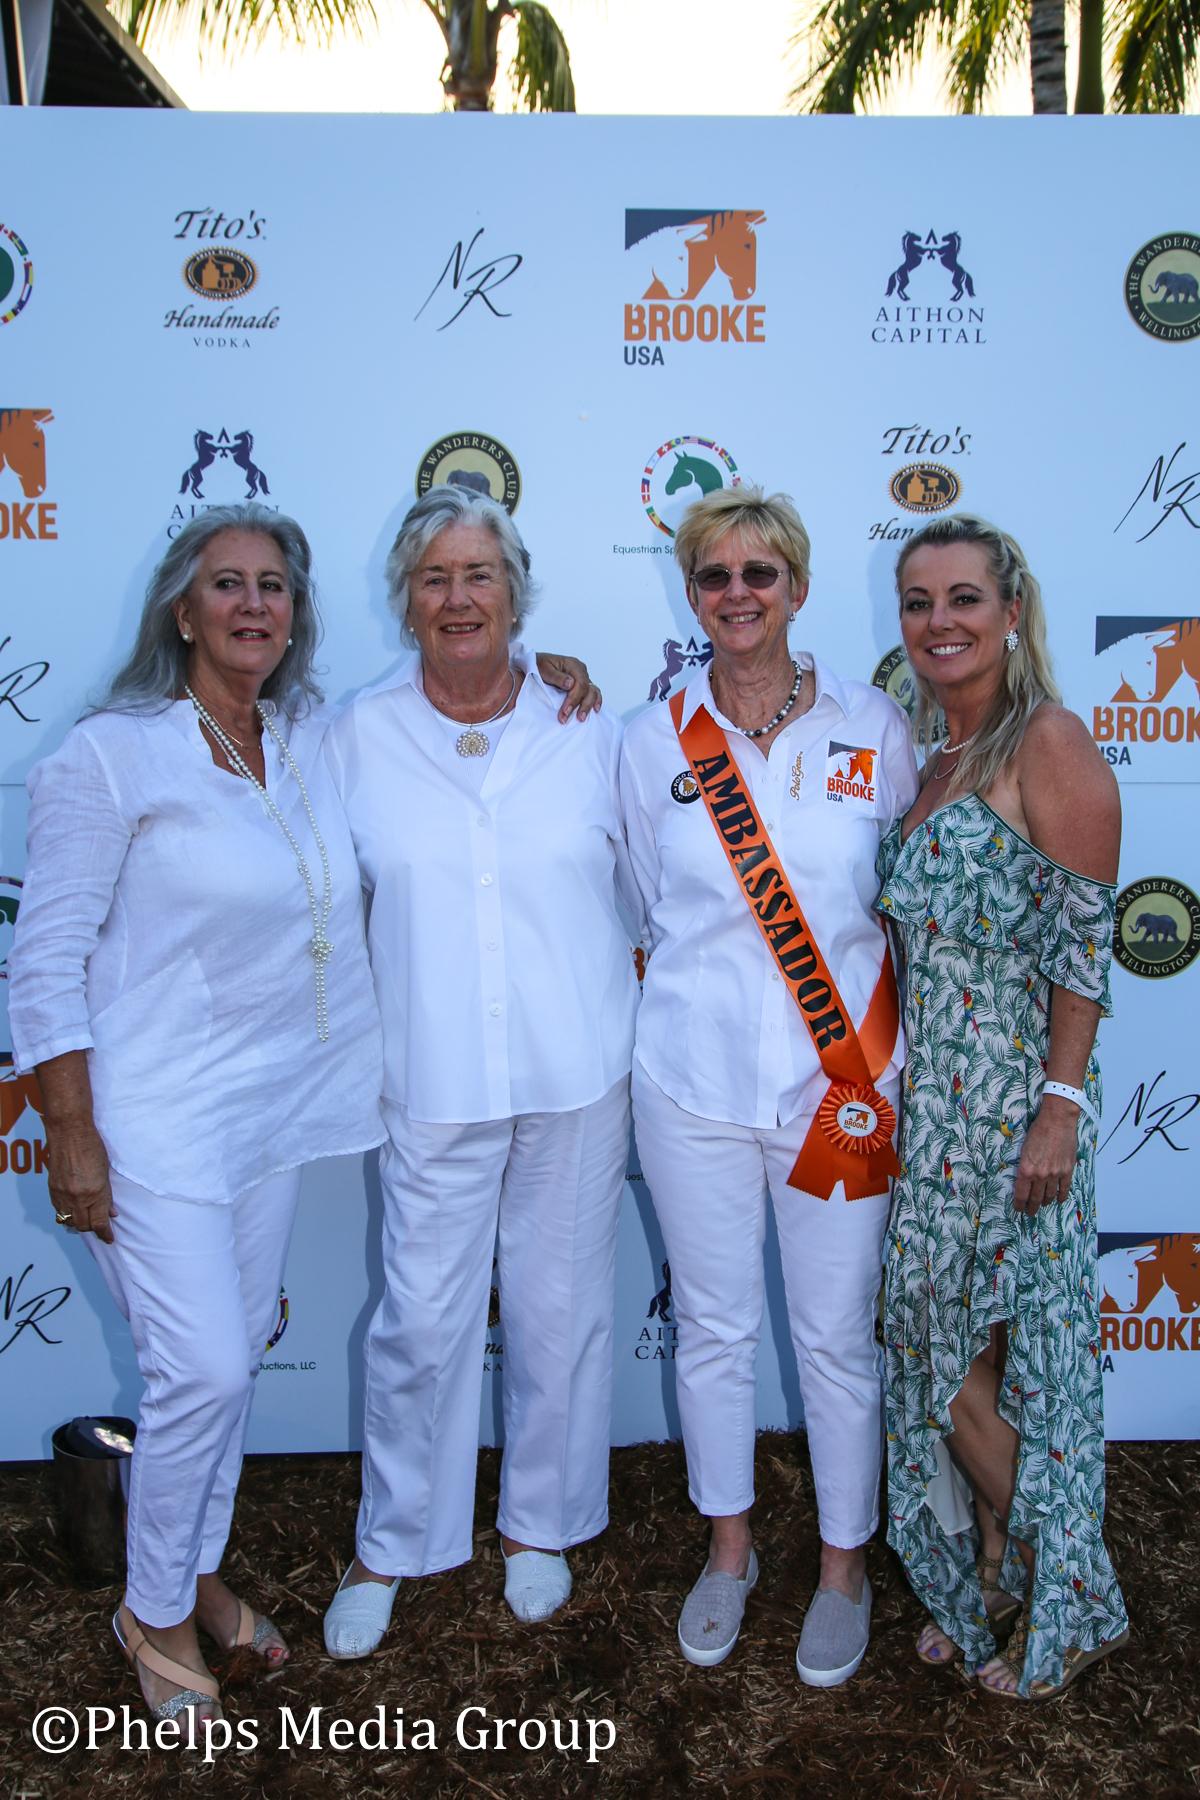 Margaret Duprey Kressa Pederson Gill JOhnston and Caroline Jones; Nic Roldan's 2nd Annual Sunset Polo & White Party, FL, by Phelps Media (1).jpg